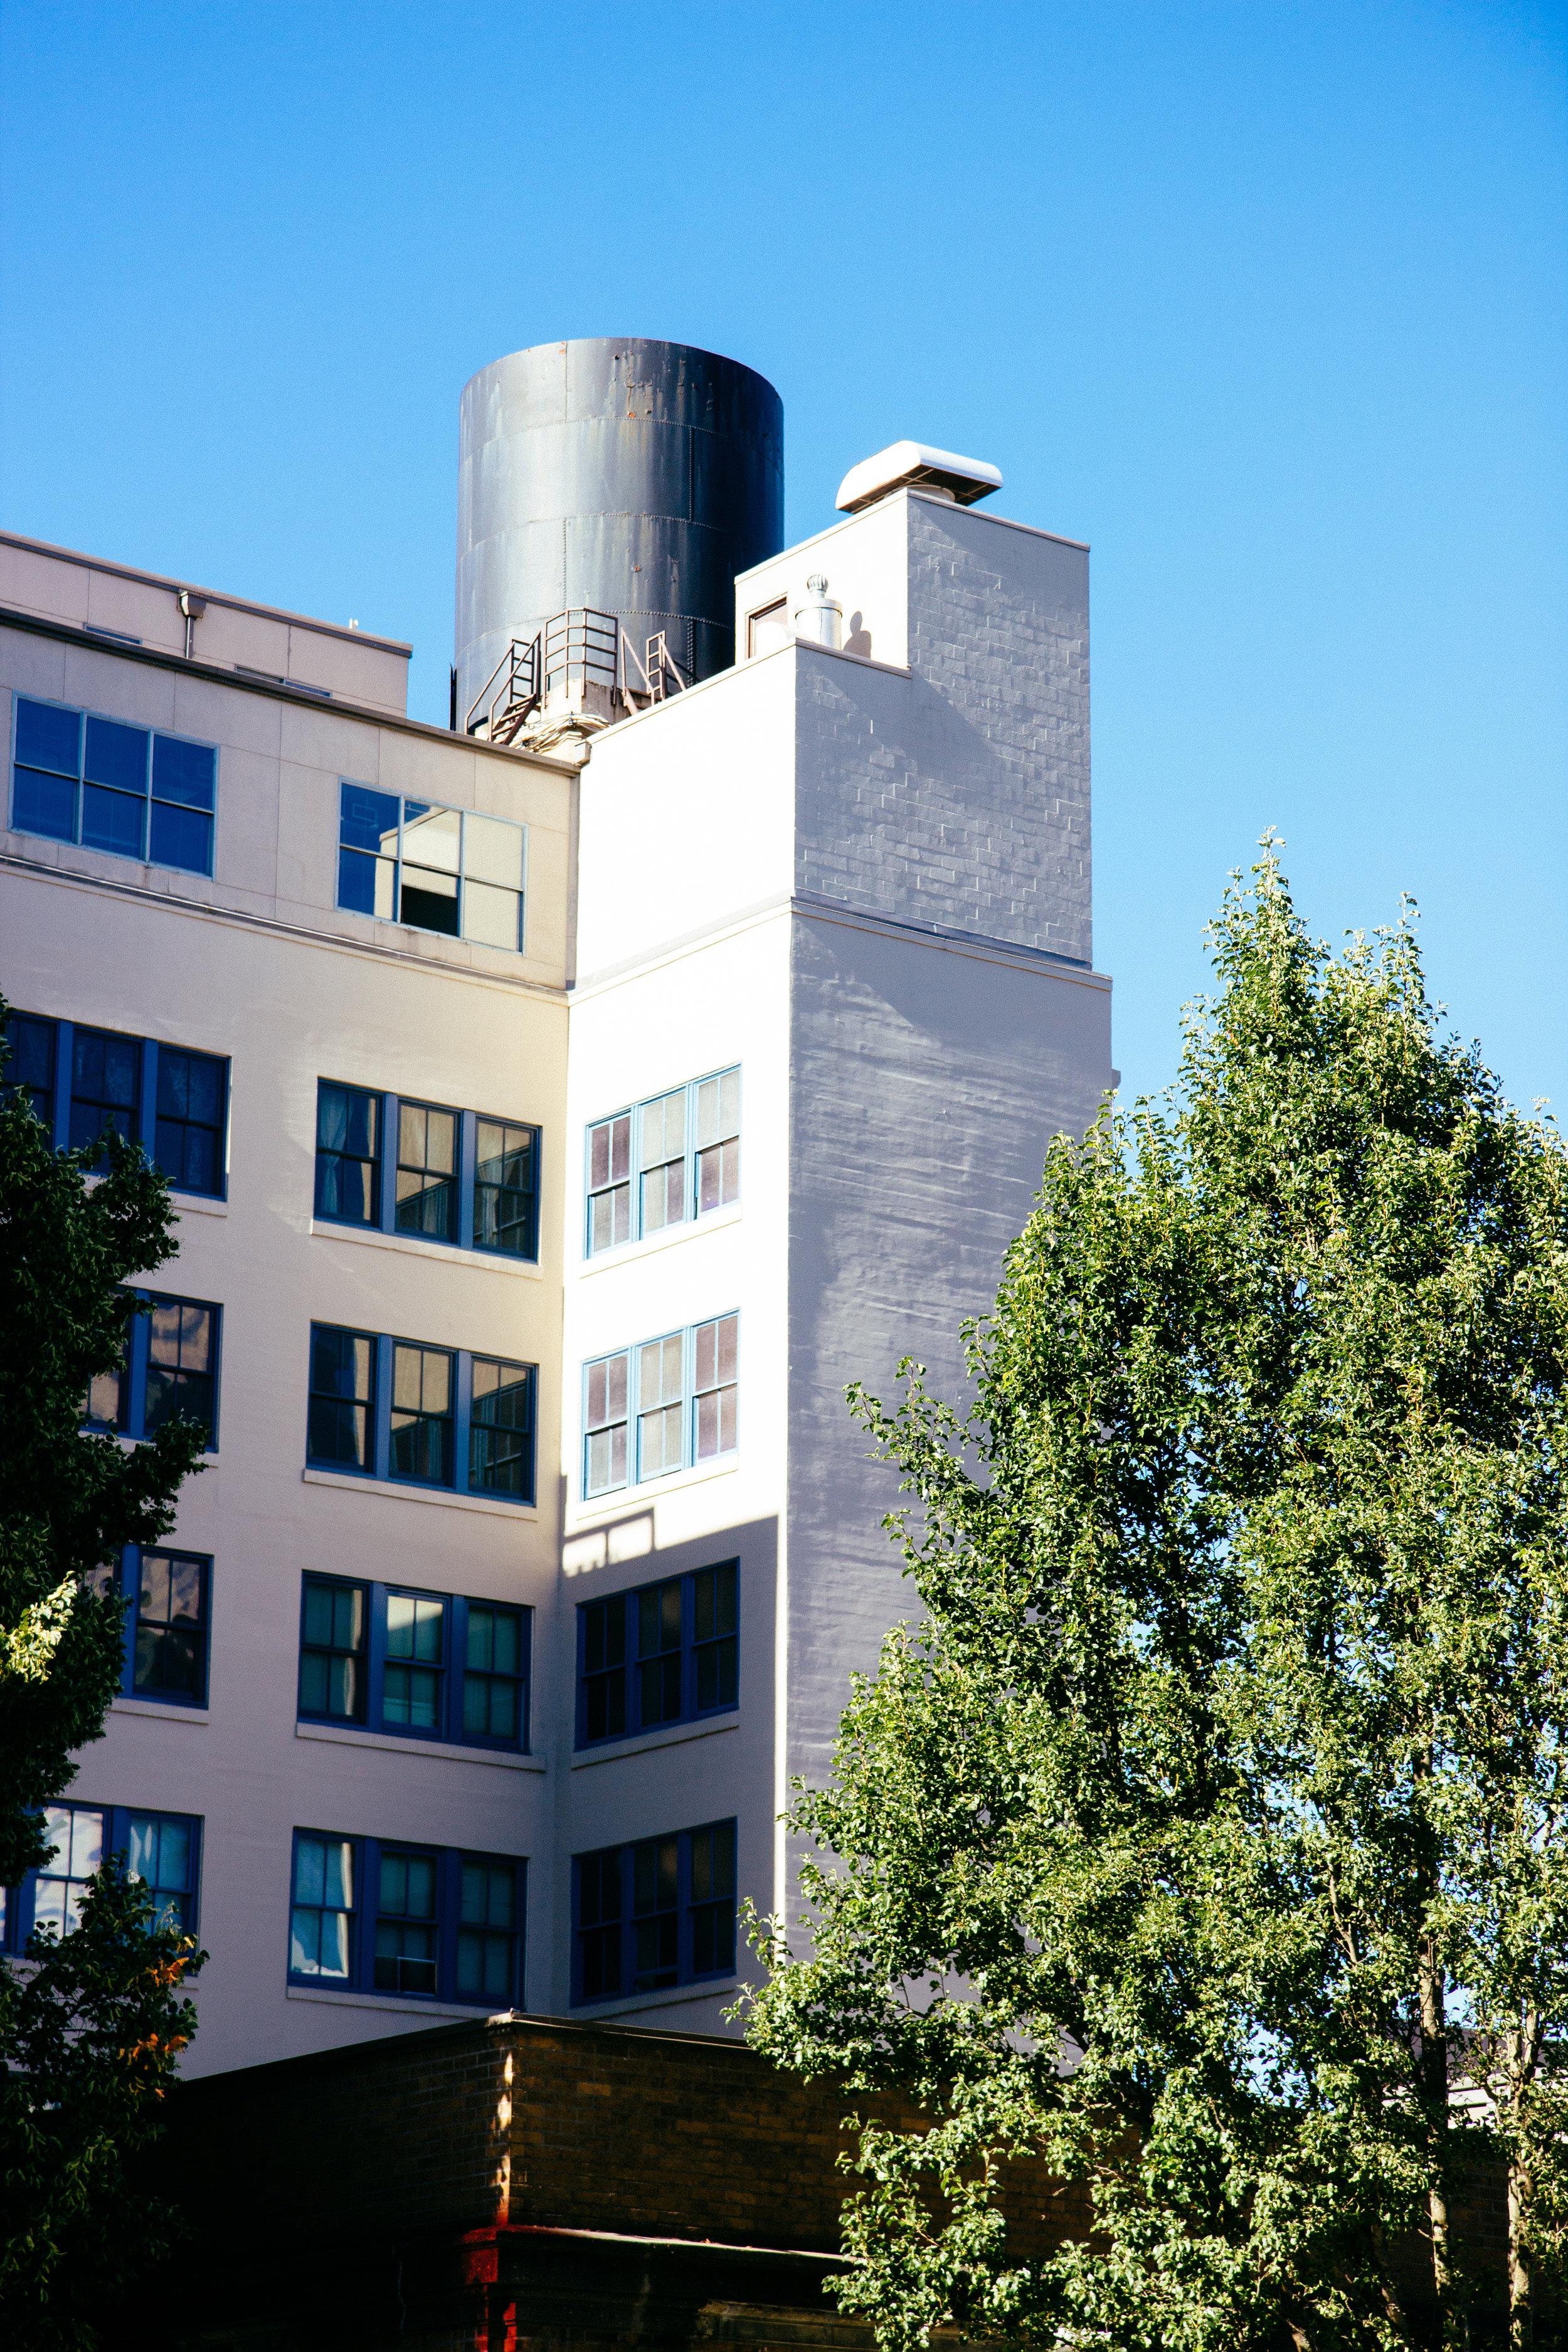 Portland city views